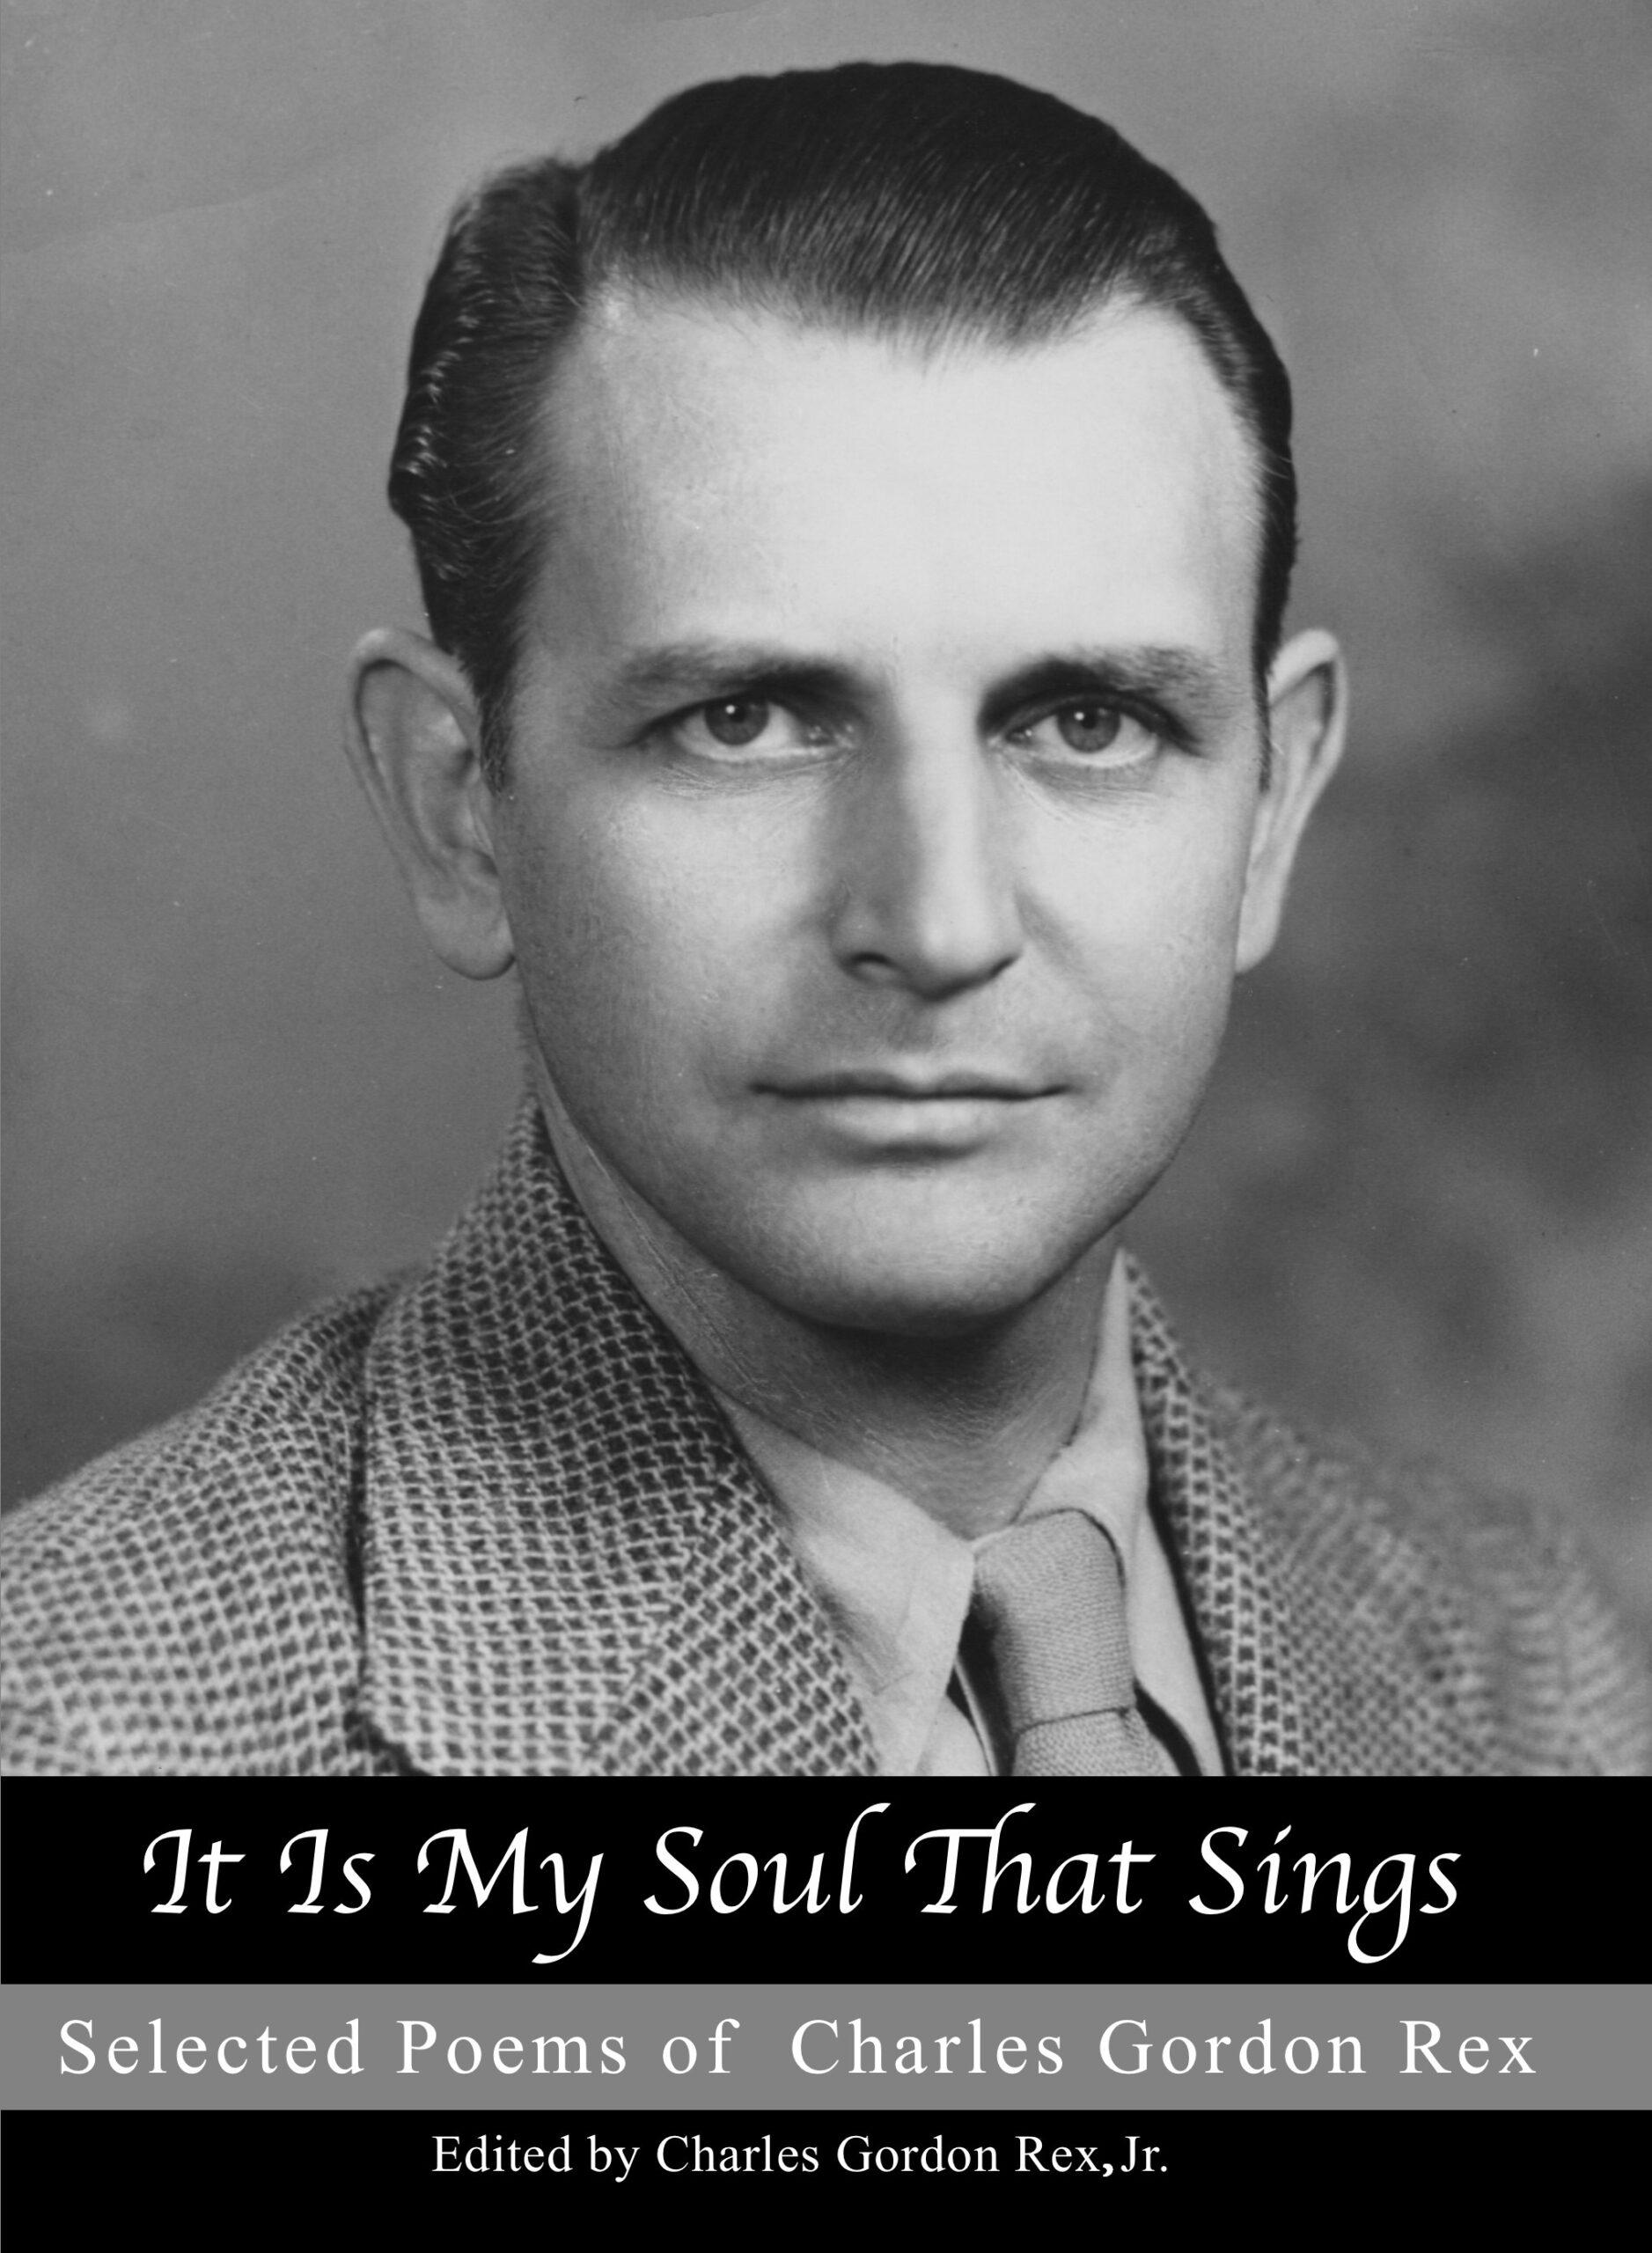 It is My Soul that Sings: Selected Poems of Charles Gordon Rex